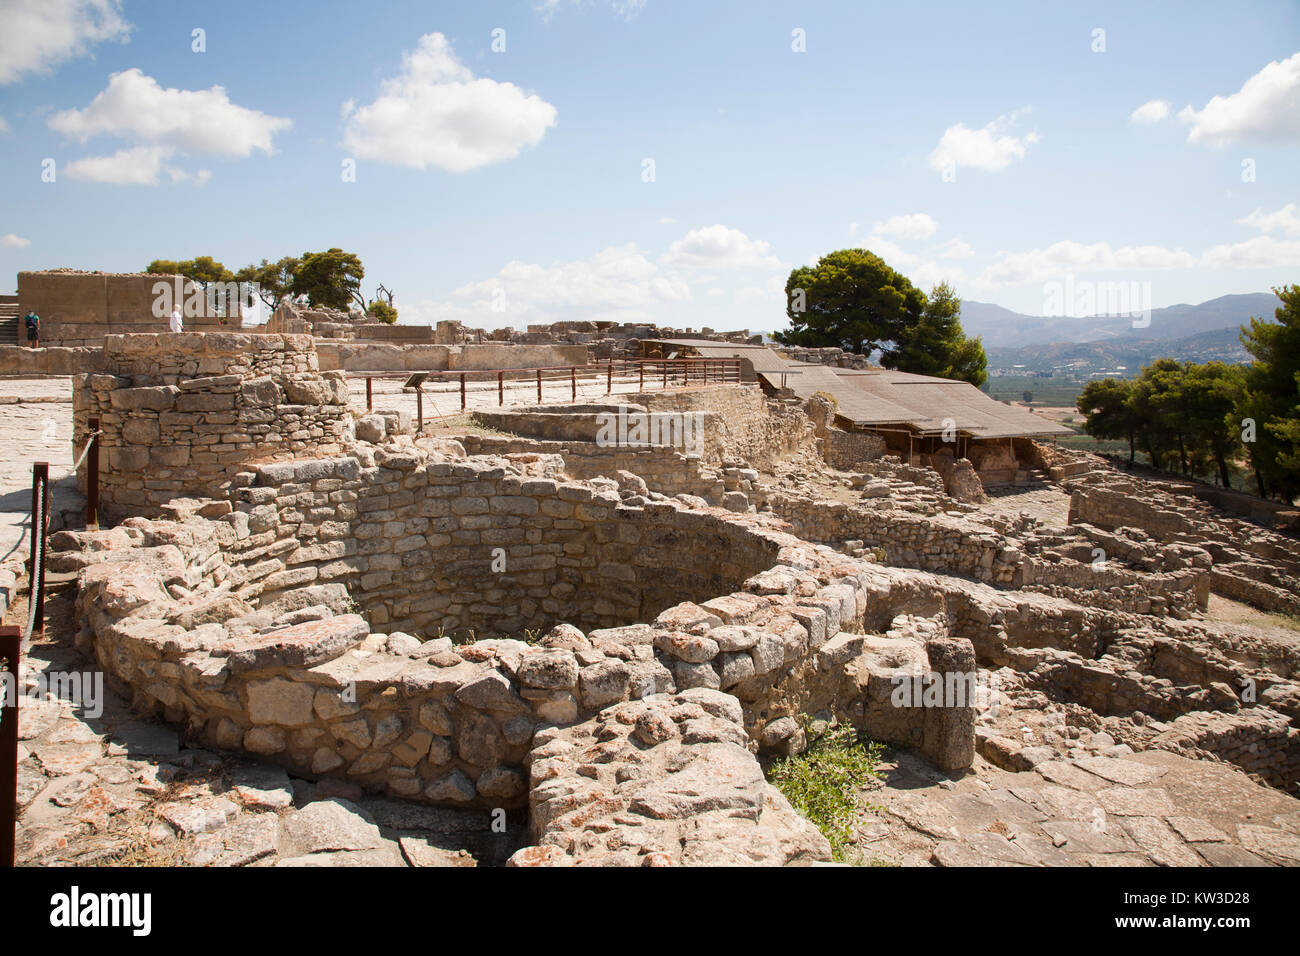 The Kouloures, Festos, archeological area, Crete island, Greece, Europe Stock Photo